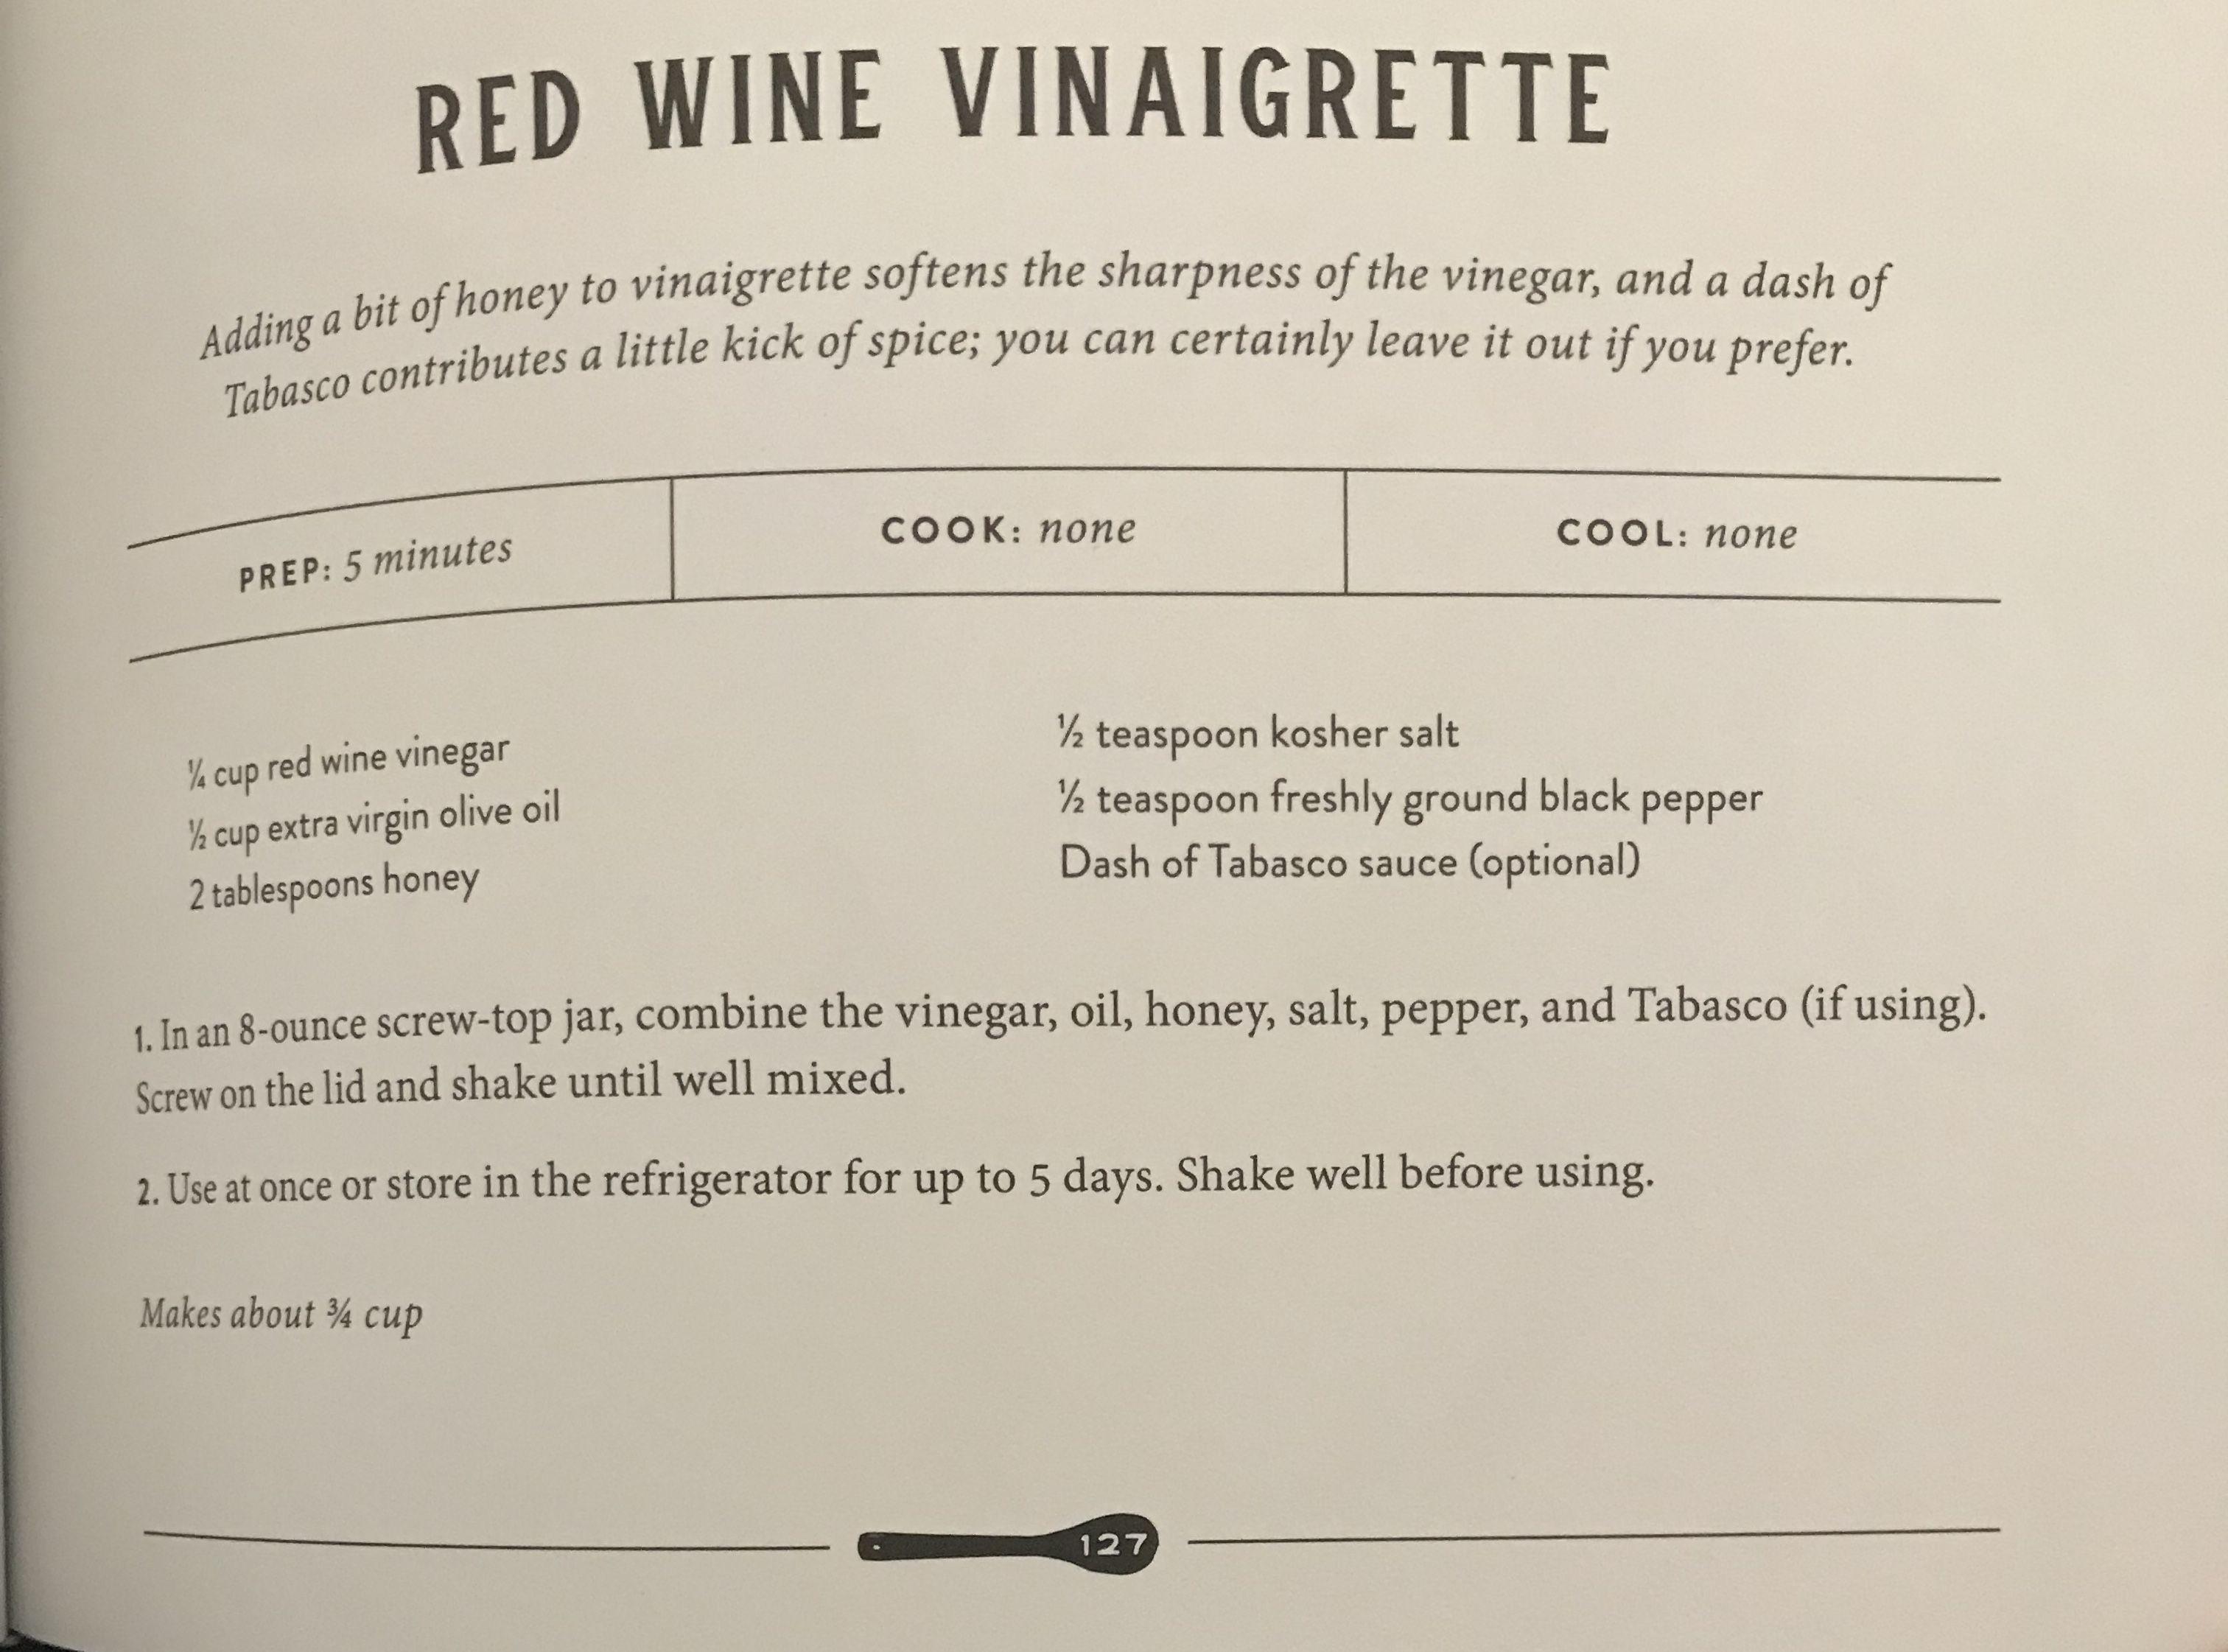 Disney Pixar Toy Story Floating Alien Long Sleeve T Shirt Red Wine Vinaigrette Dressing Recipe Vinaigrette Recipes [ 2242 x 3024 Pixel ]